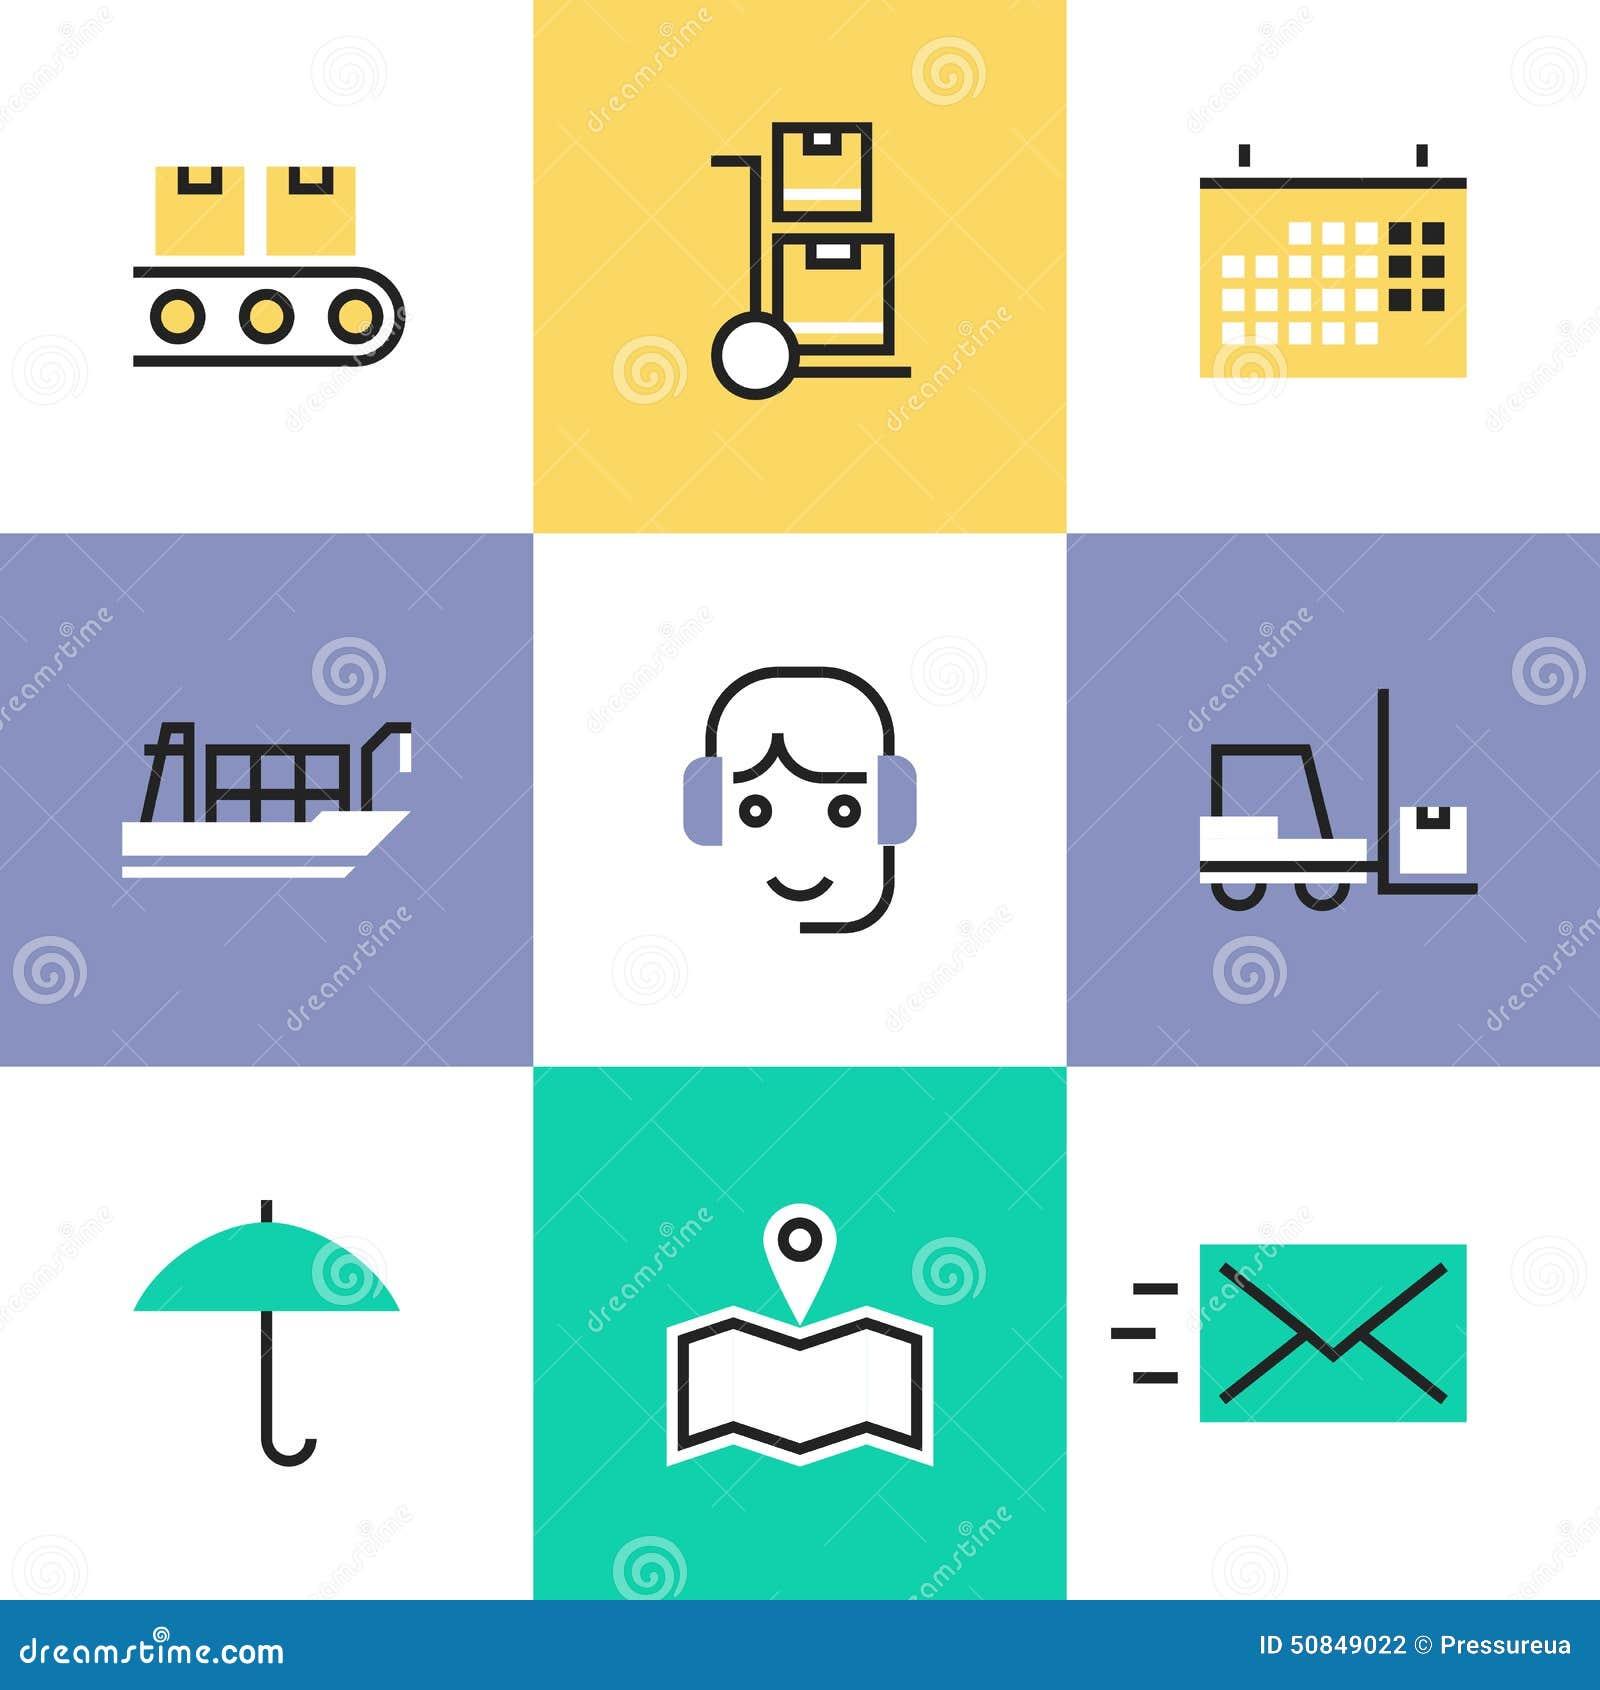 Logistics Calendar Design : Logistics industry services pictogram icons set stock